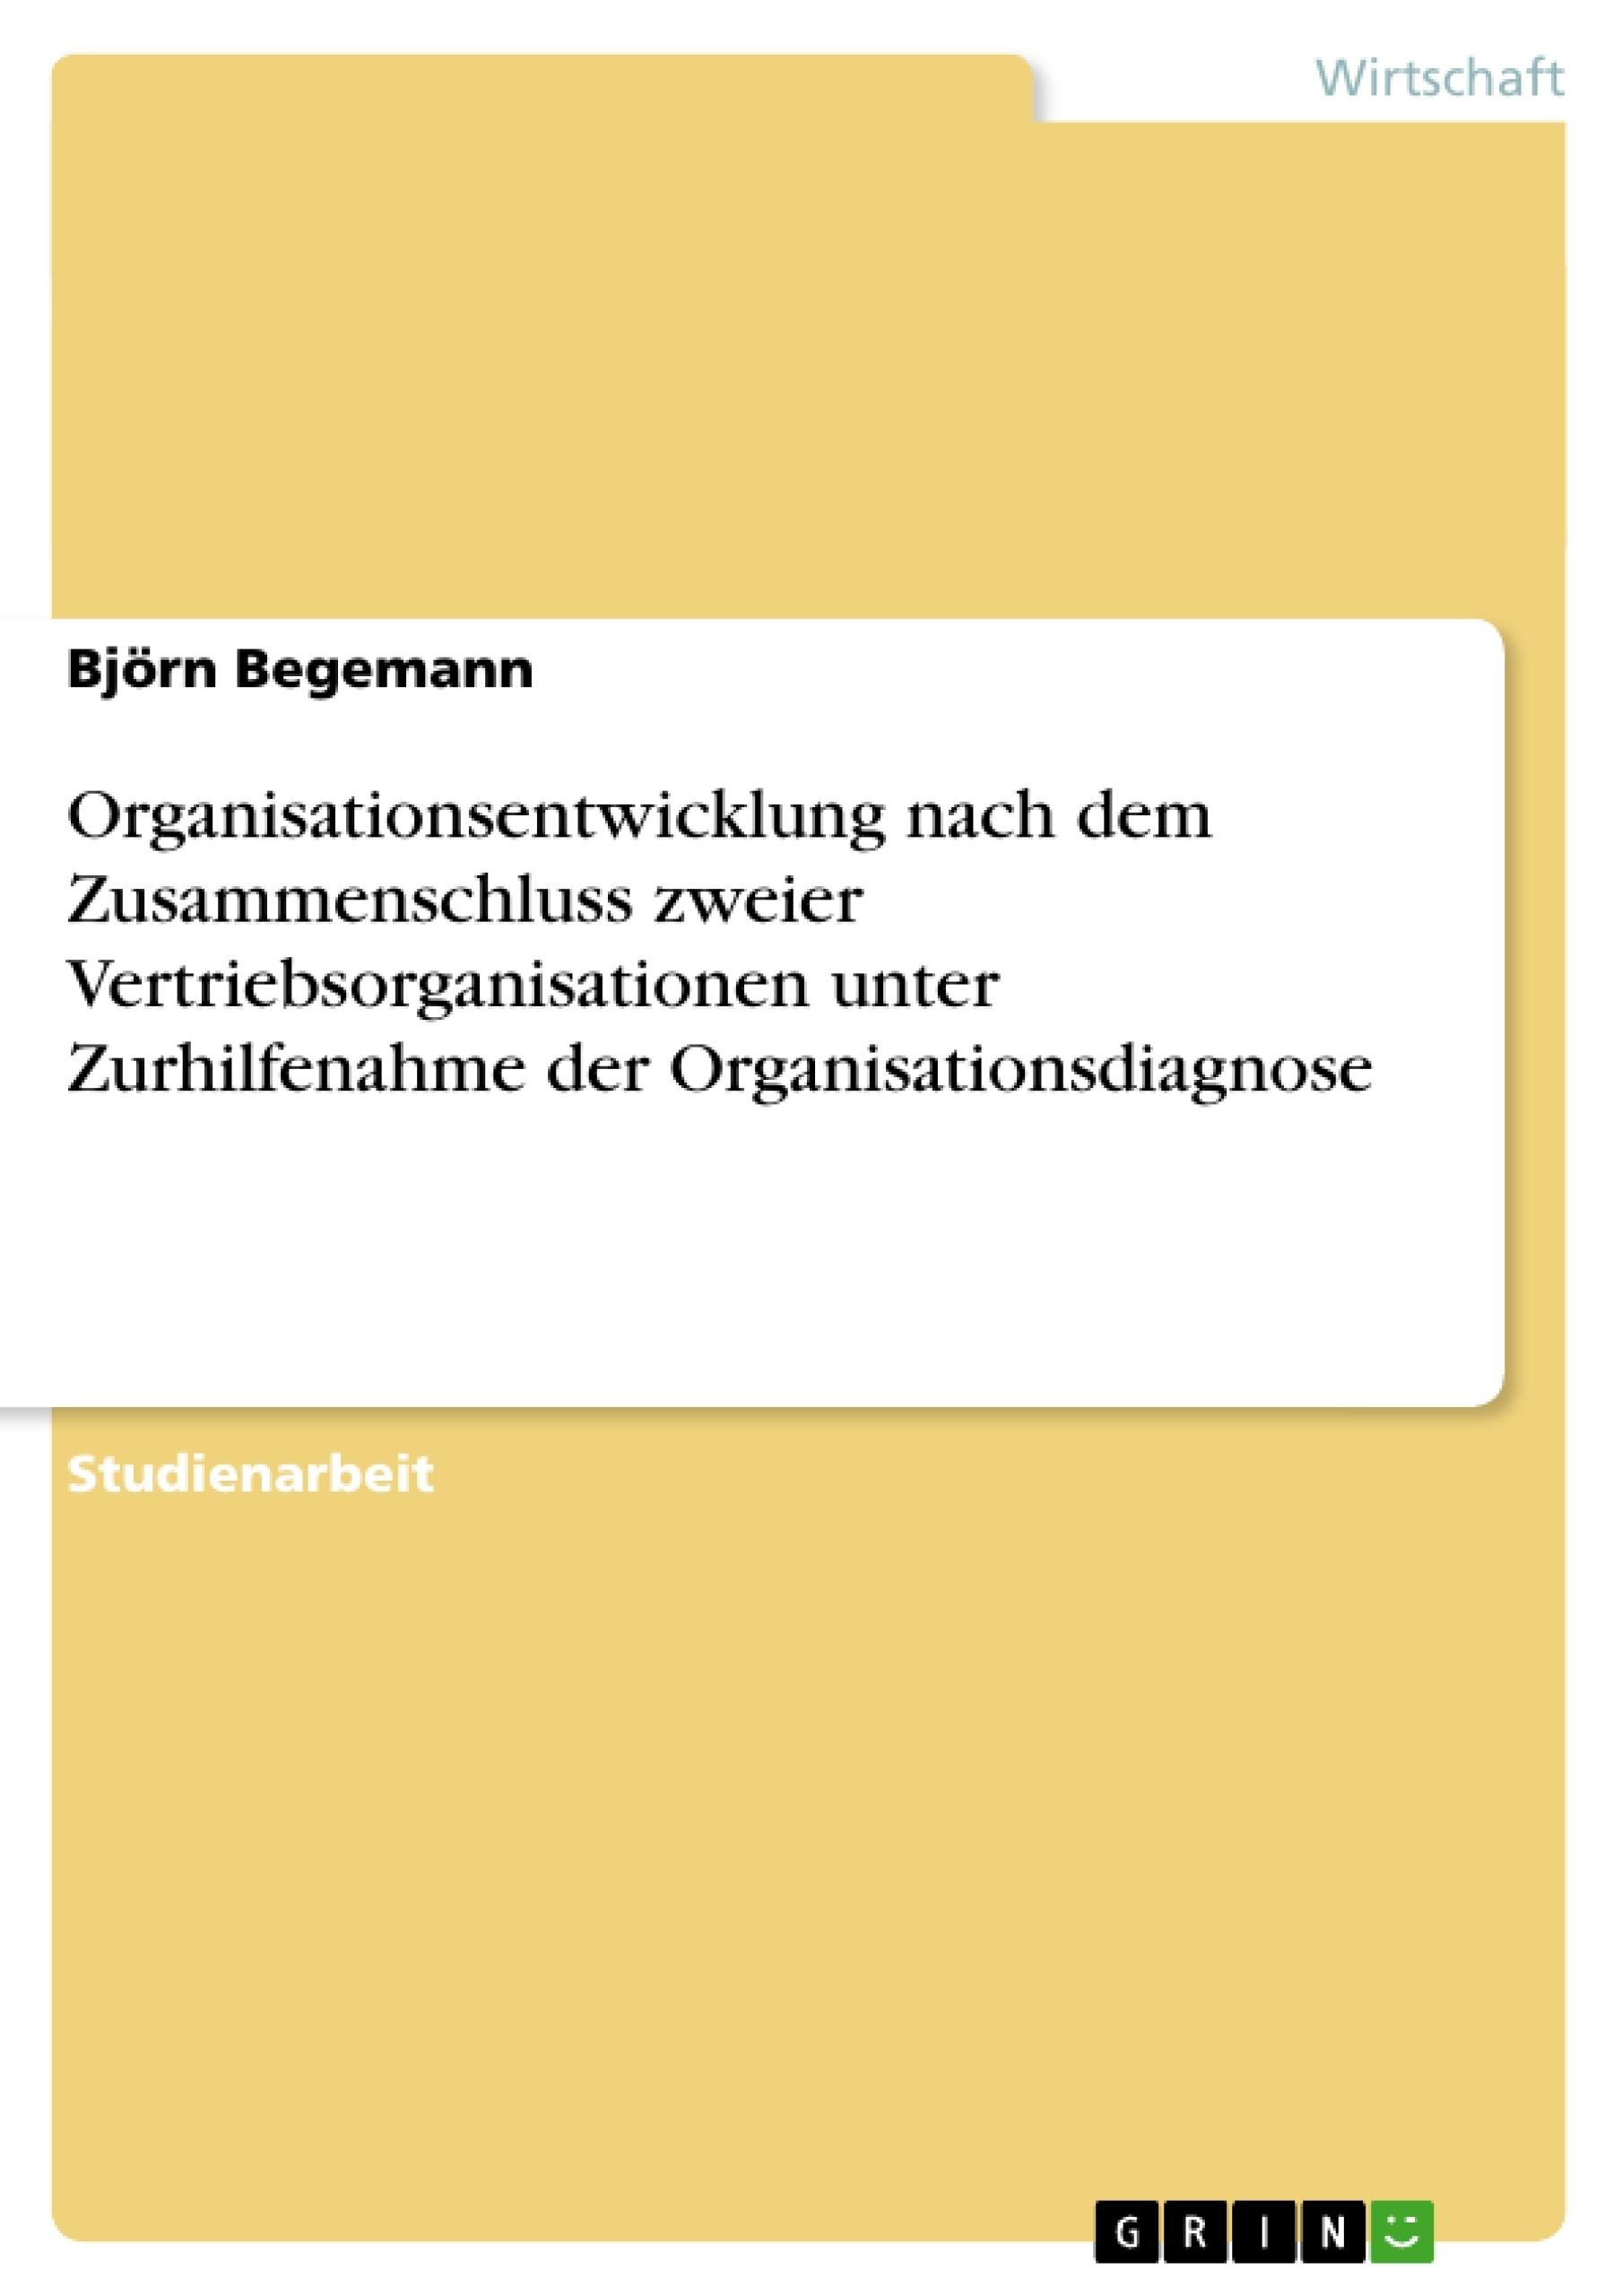 Fantastisch Strategische Planung Arbeitsblatt Fotos - Mathe ...